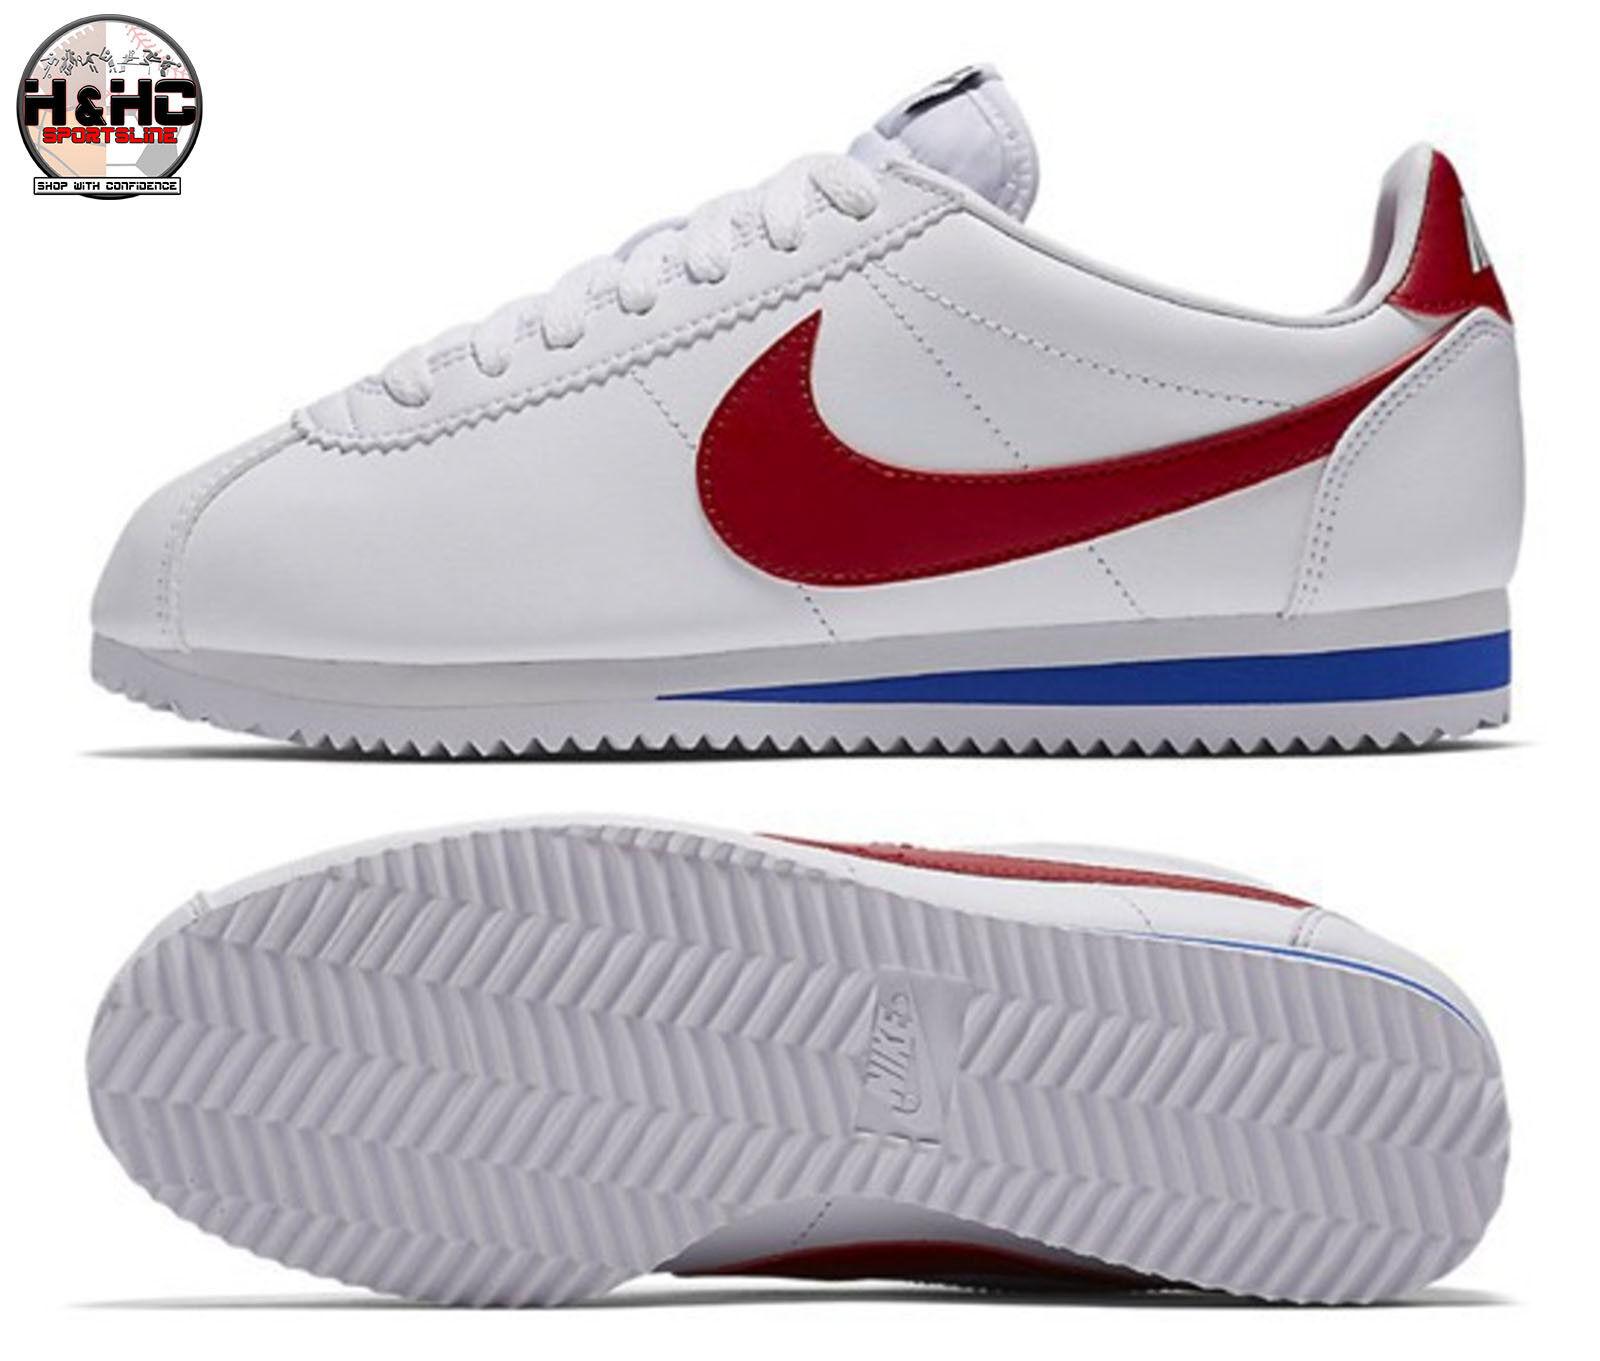 Nike Classic Cortez Leather OG 807471 103 Sz White/Varsity Red Women's Shoes Sz 103 11 aaaff5